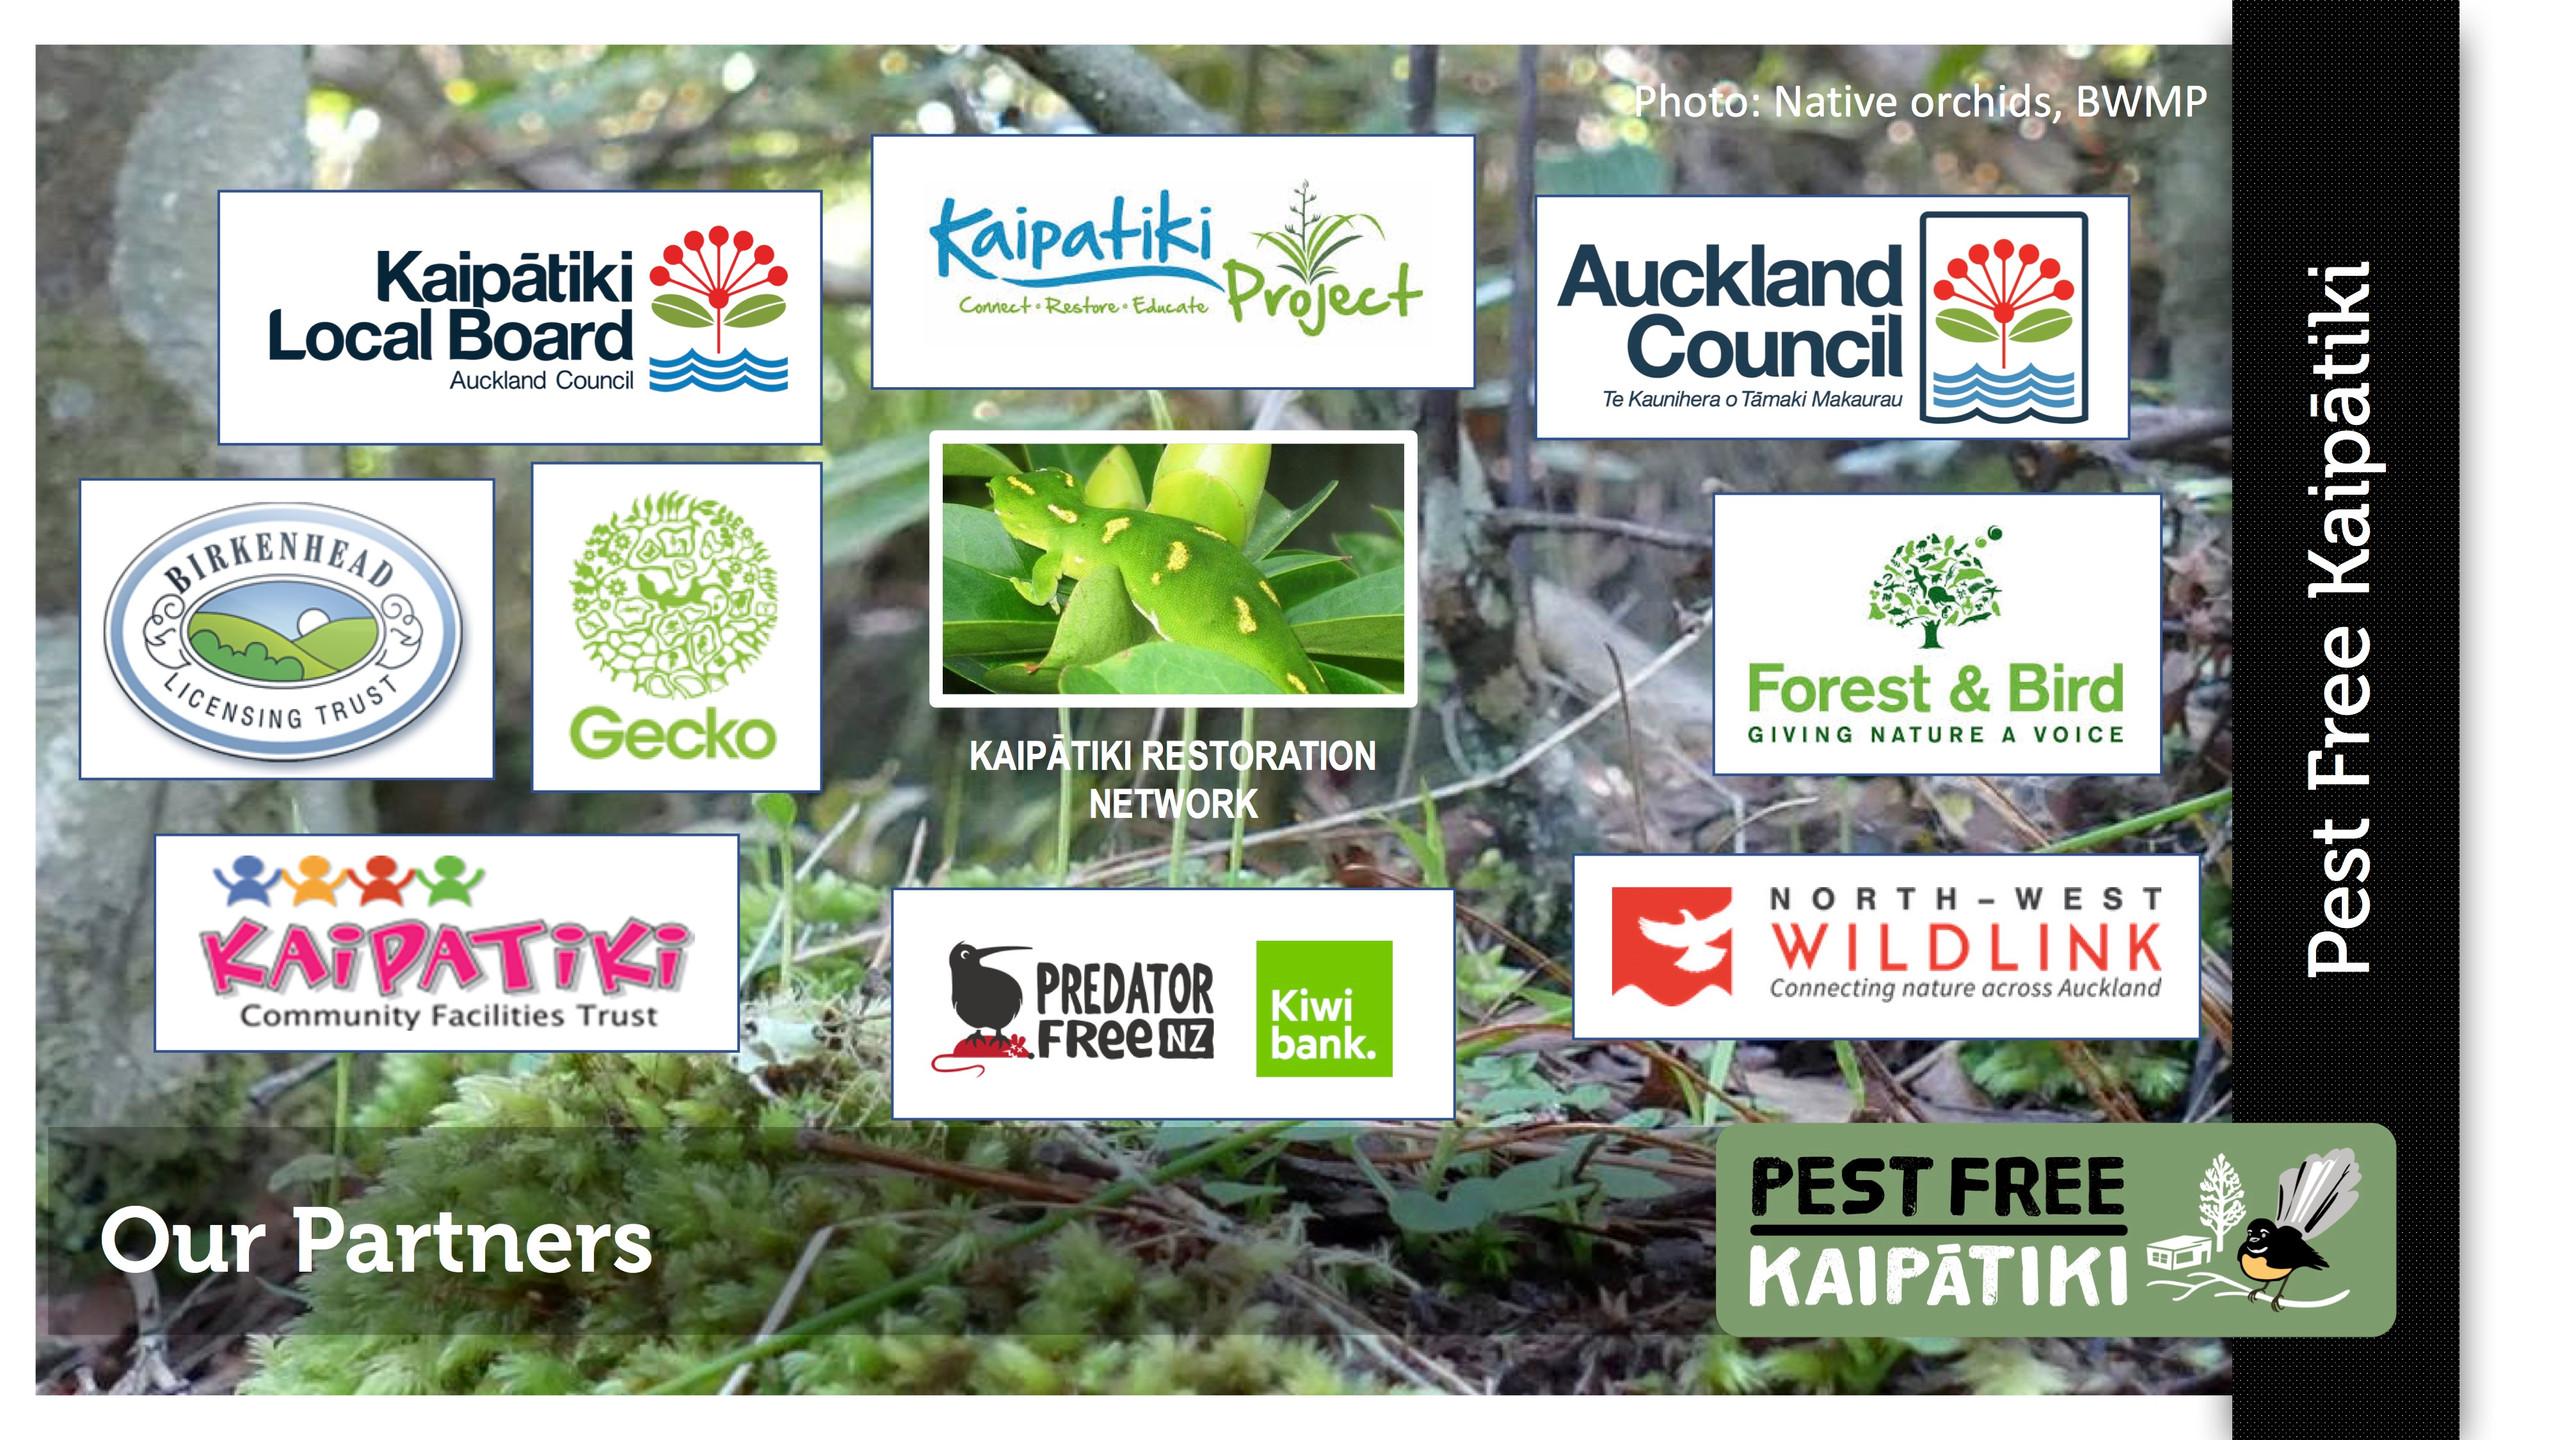 Pest Free Kaipatiki-Pestival-slide1